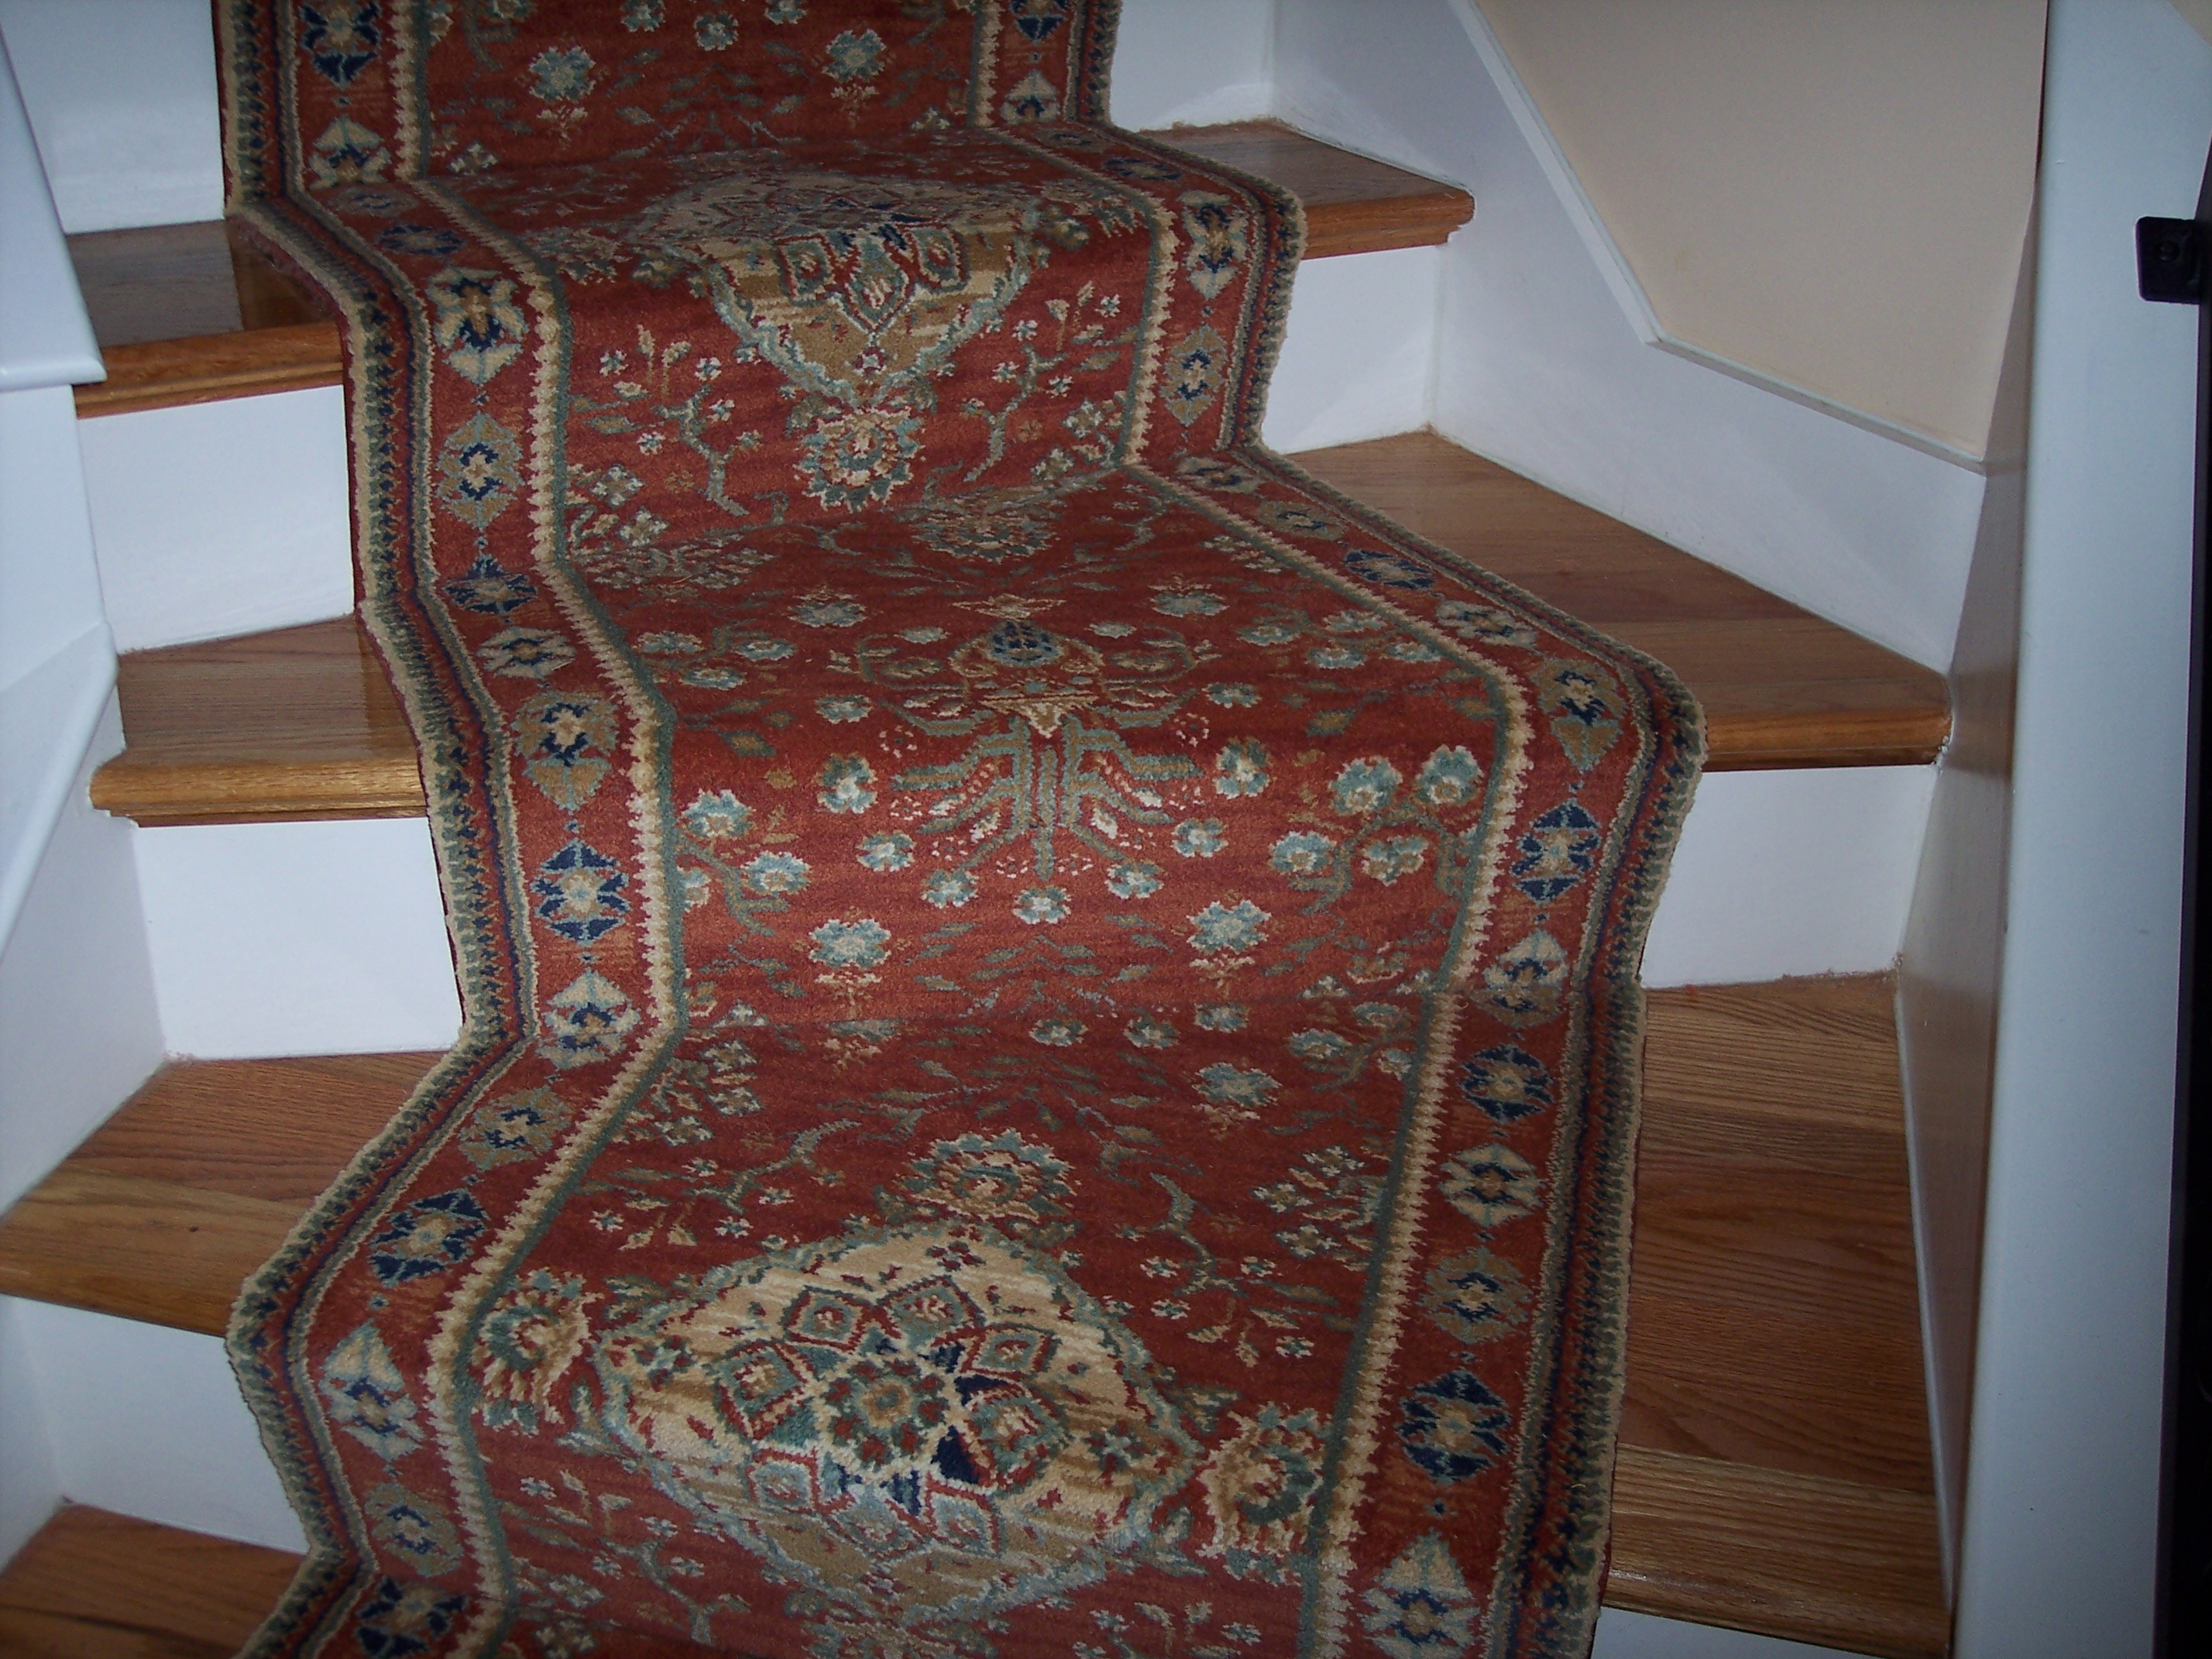 Stair Runners Luxury Flooring Design Carpet Crafters Rug Co